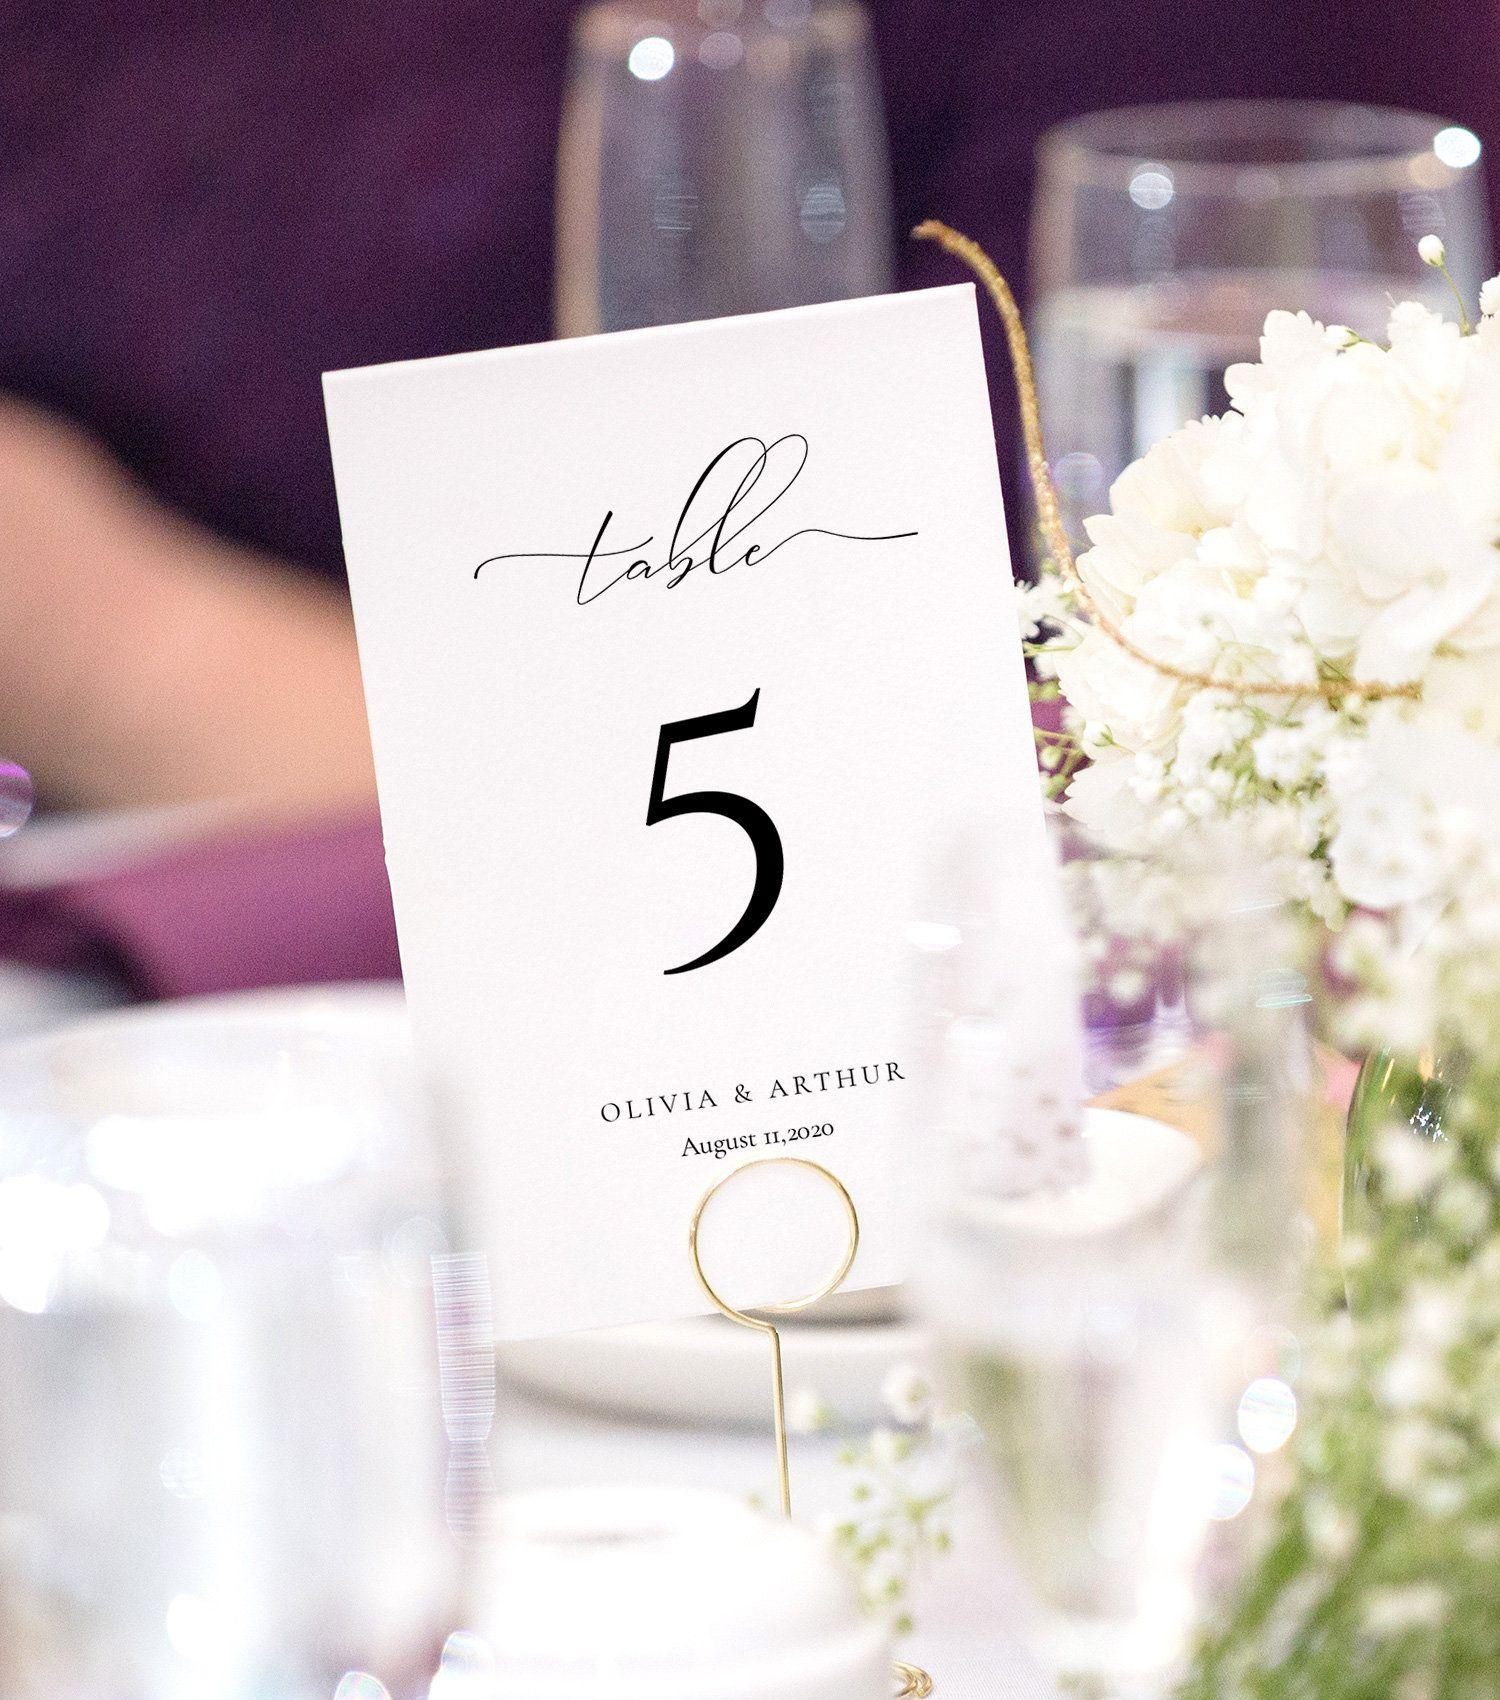 Script Elegance Wedding Table Number Template Calligraphy Etsy In 2021 Wedding Table Numbers Template Wedding Table Numbers Card Table Wedding